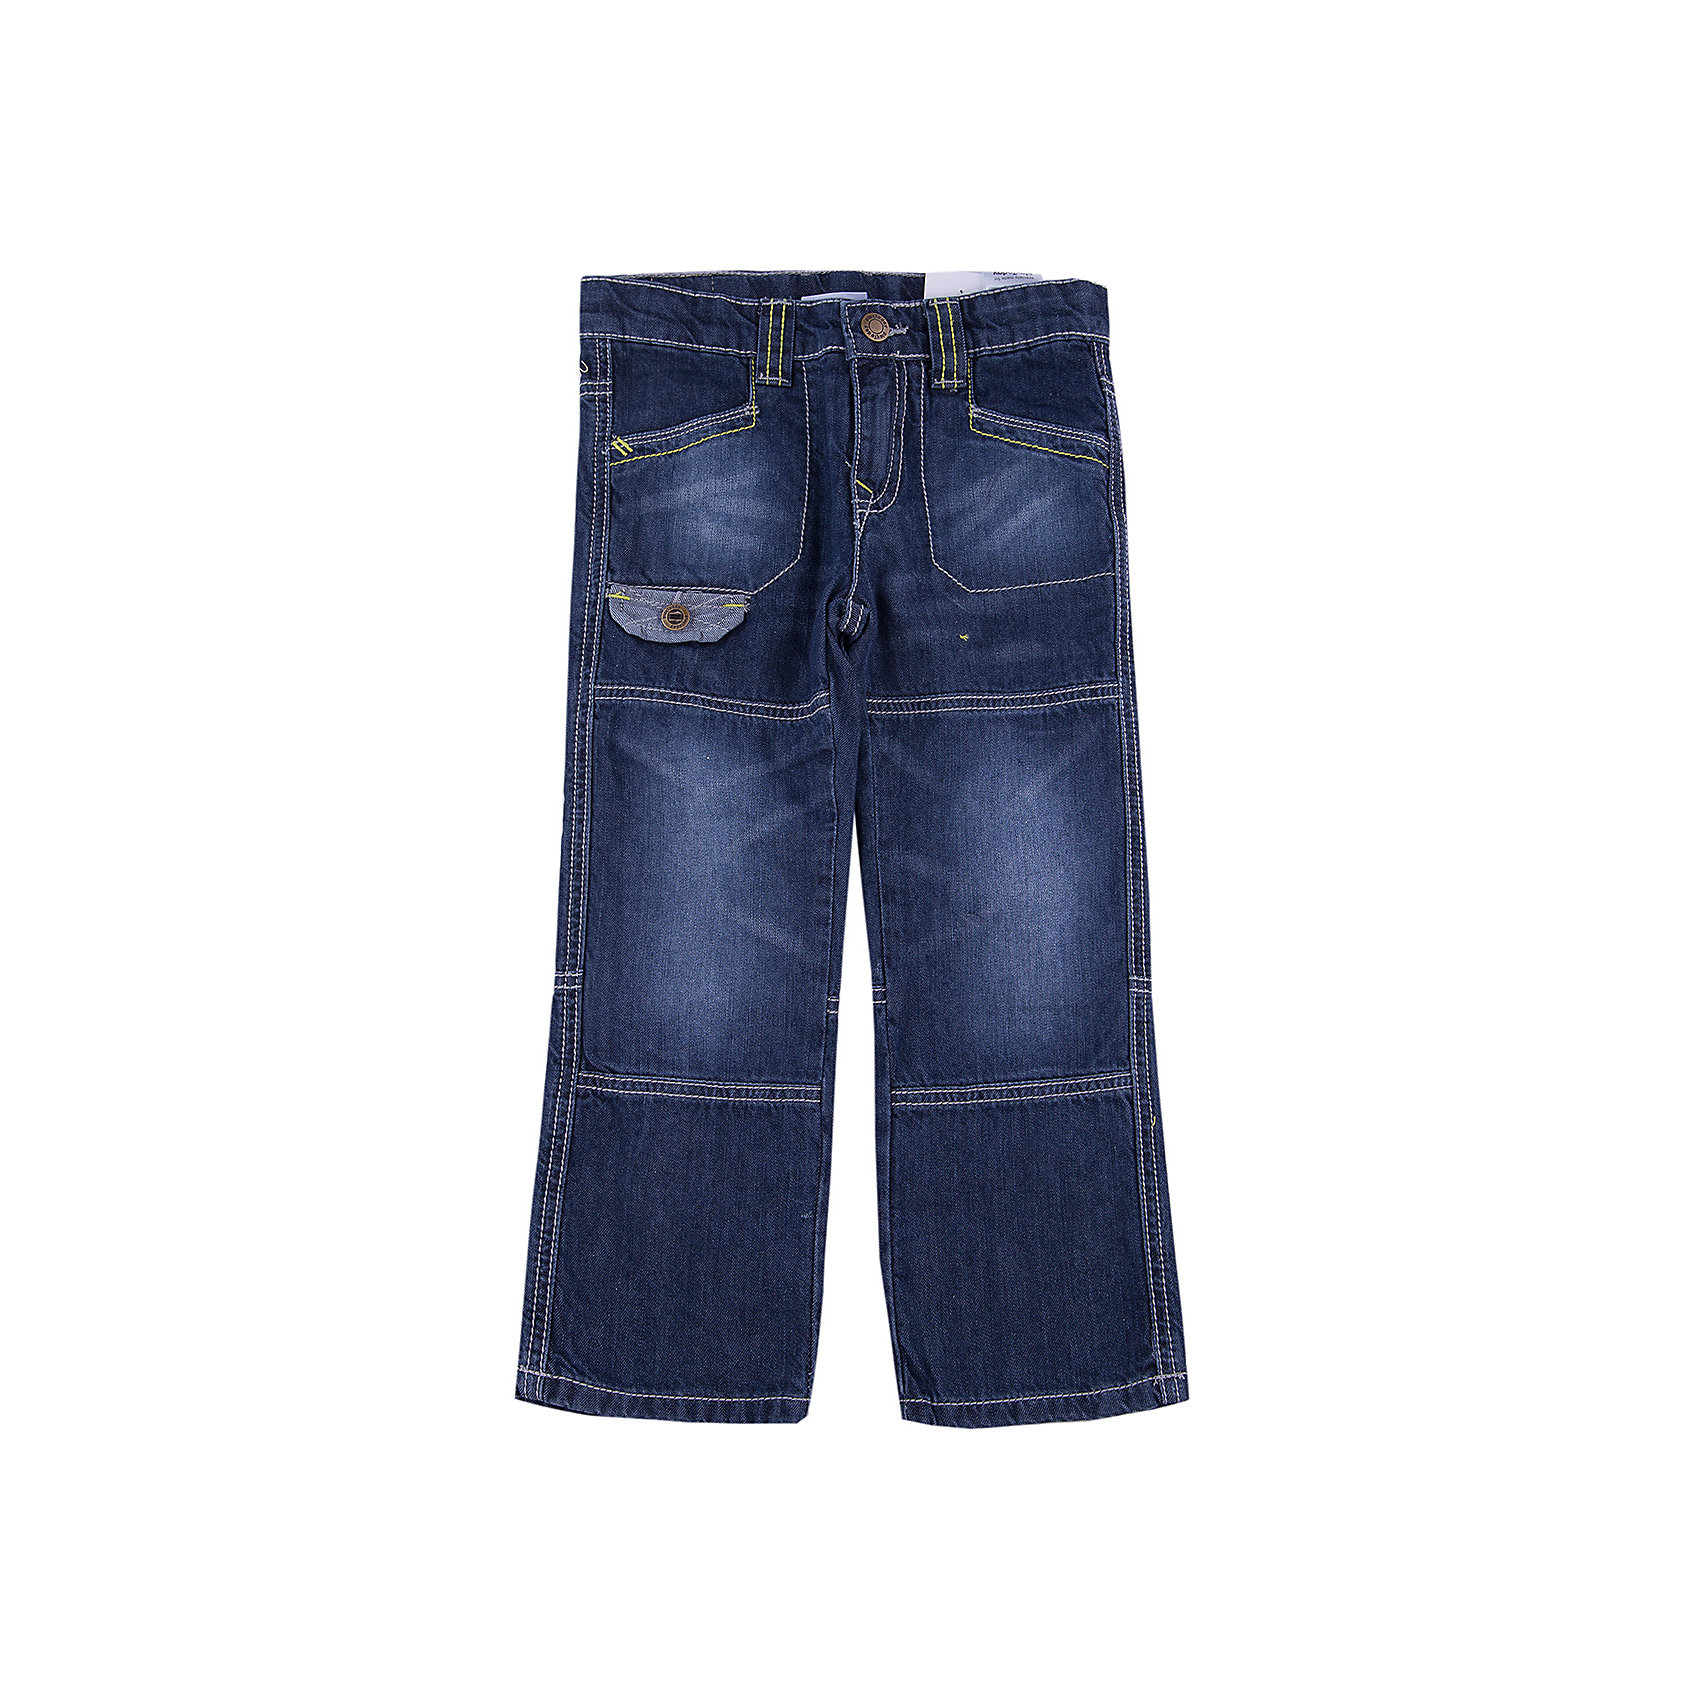 PlayToday Джинсы для мальчика PlayToday джинсы playtoday playtoday mp002xg006ns